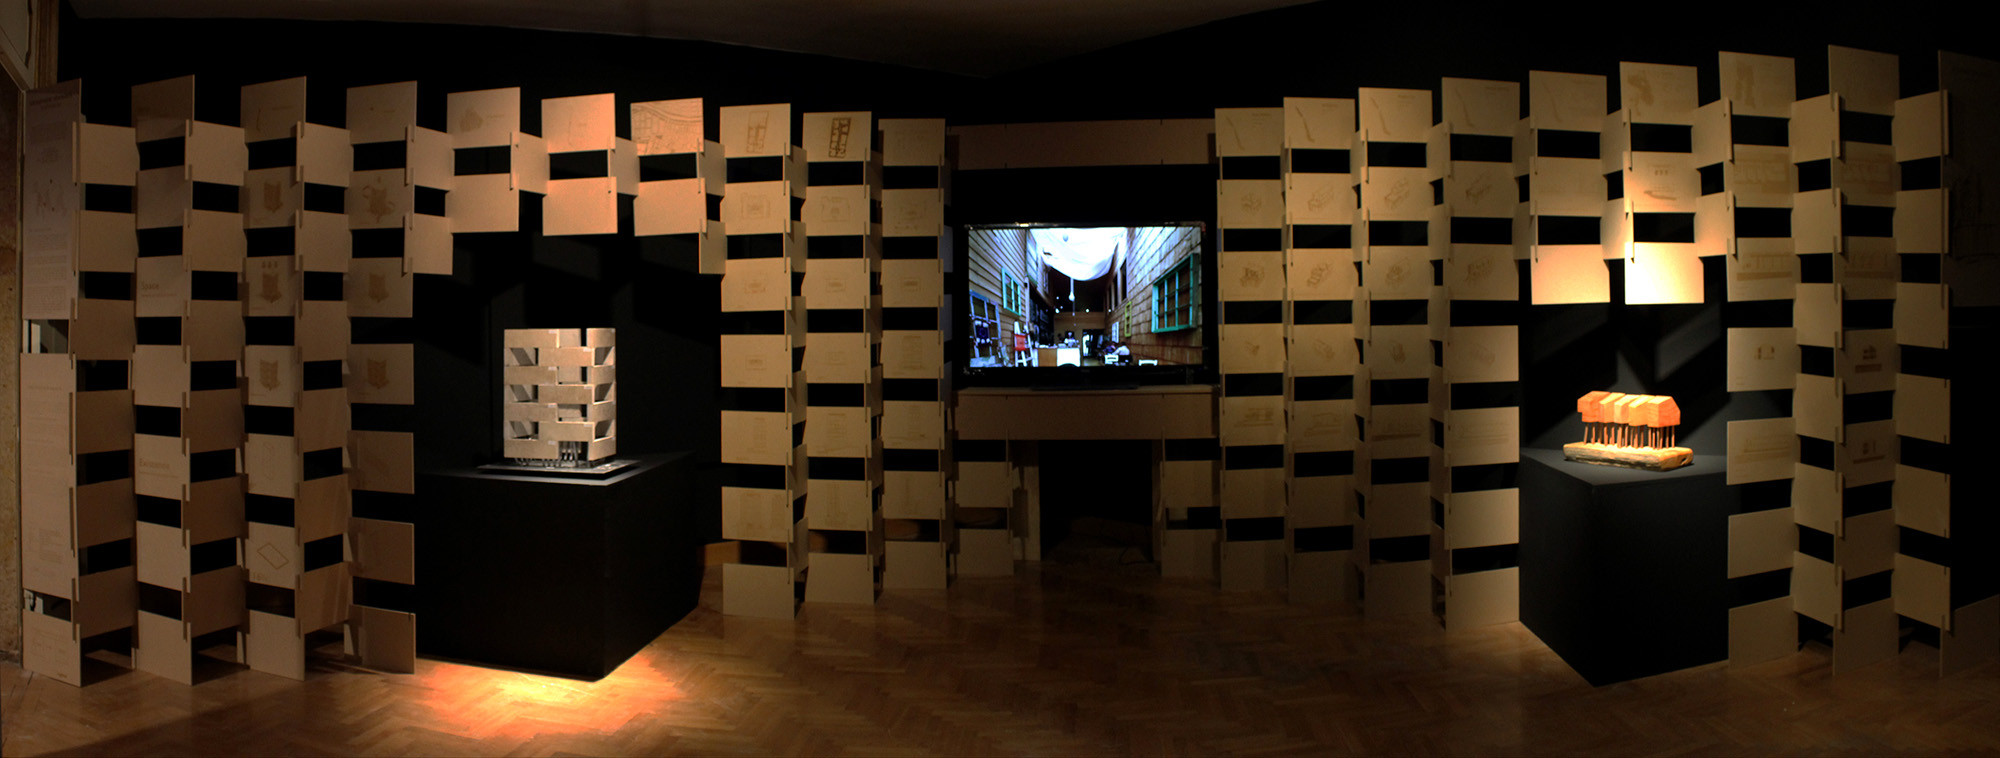 Bienal de Venecia 2014: Arquitectura singular como Renovacion Urbana/Rural en Chile, Panorámica Exhibición. Image © Eduardo Maldonado